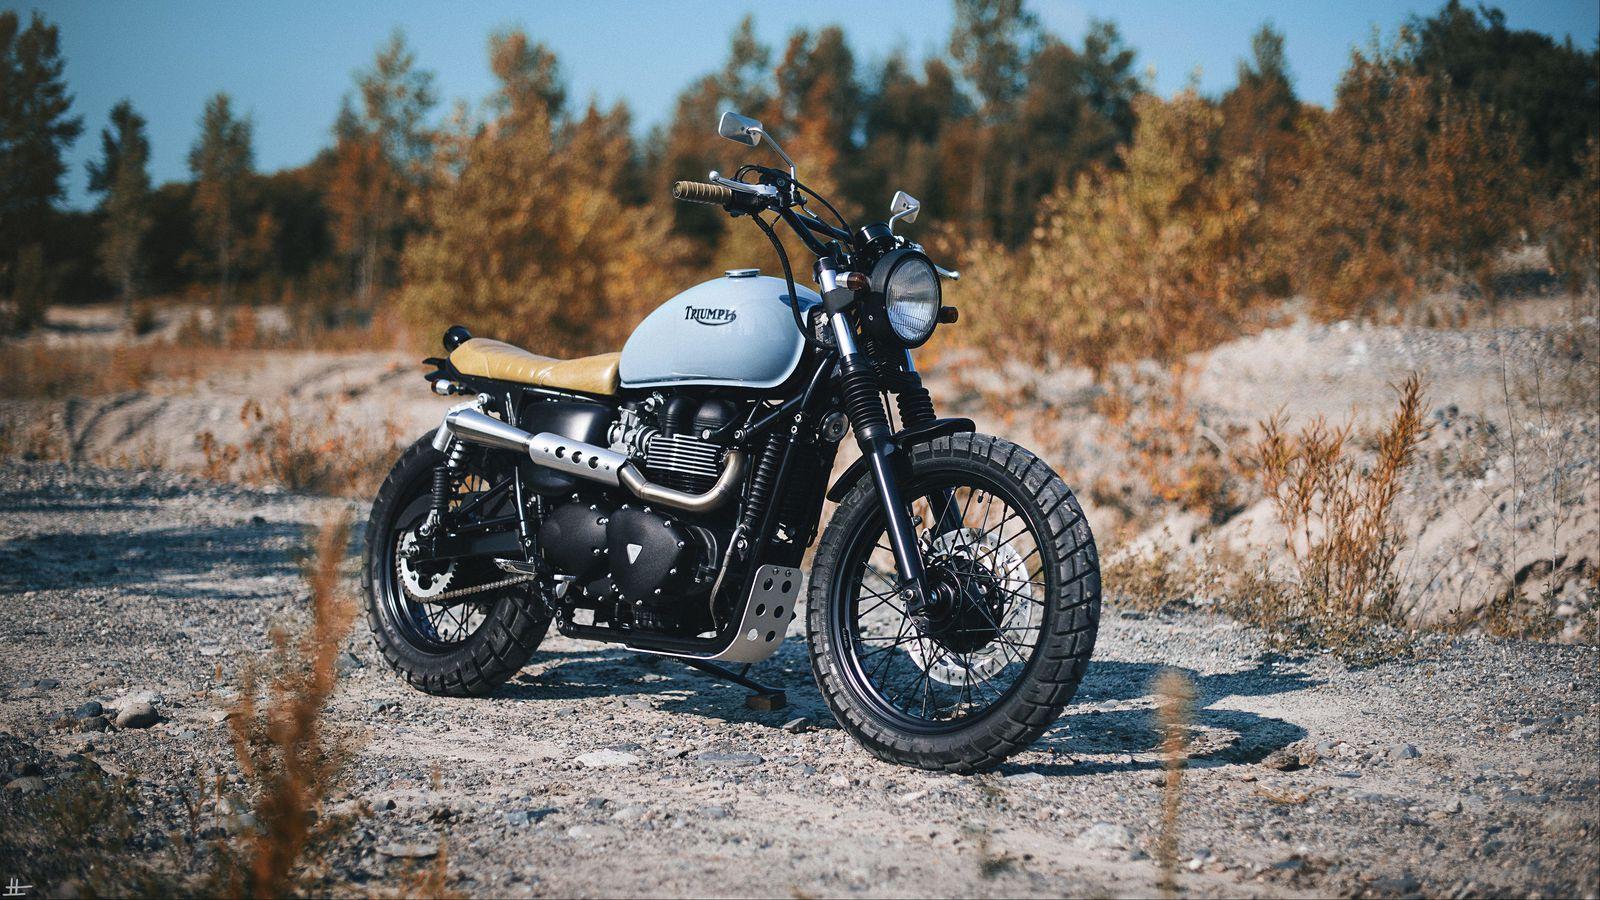 1600x900 Обои triumph, bonneville, мотоцикл, вид сбоку